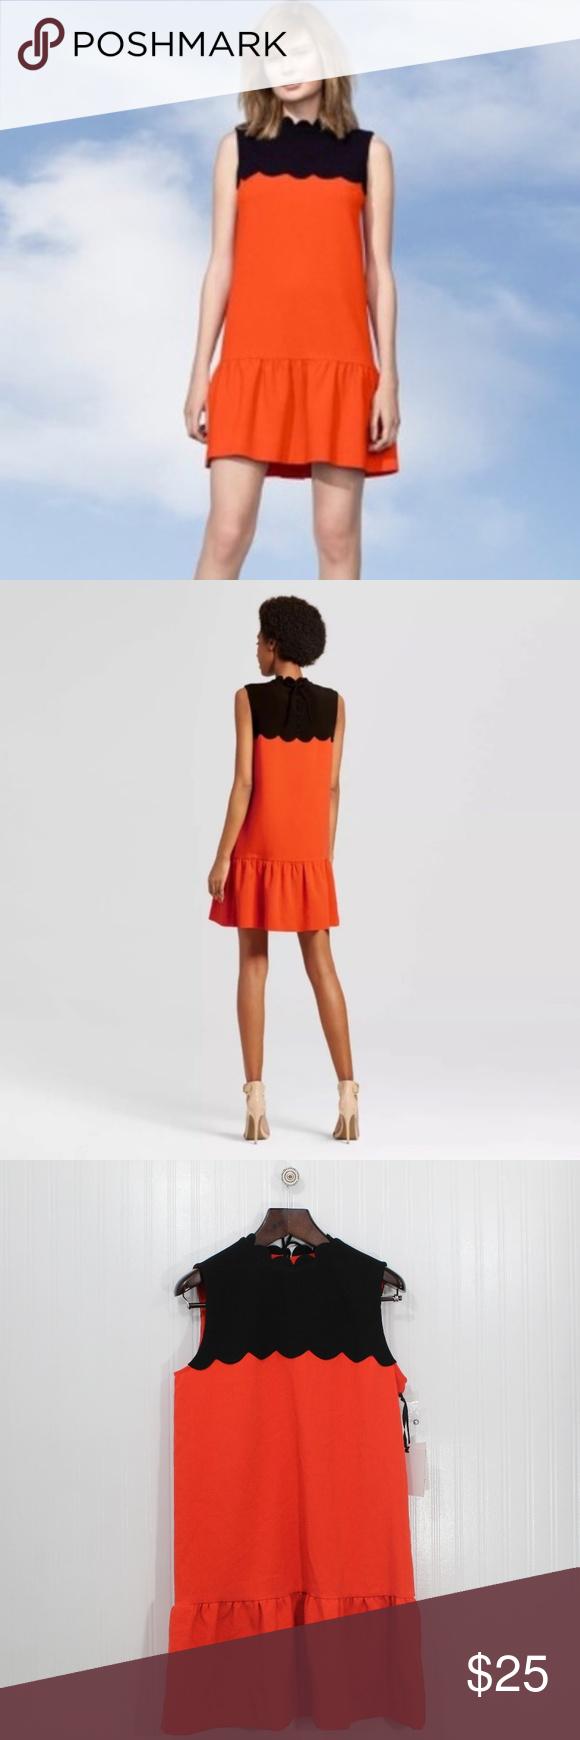 Victoria Beckham For Target Red And Black Dress Victoria Beckham Target Target Dresses Victoria Beckham [ 1740 x 580 Pixel ]